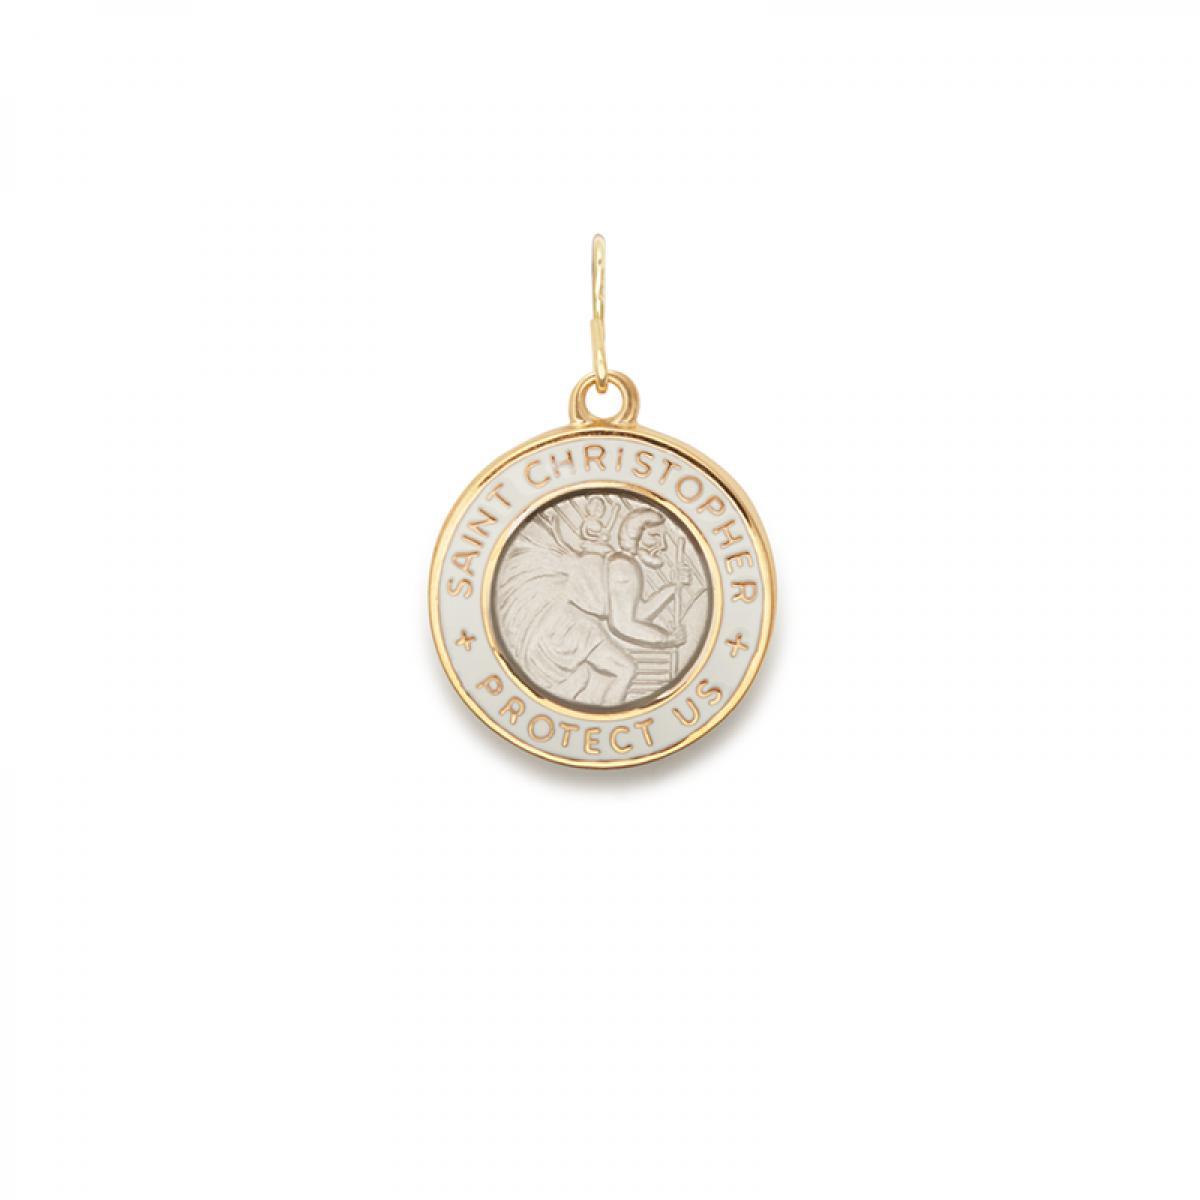 b526c75c9a1 ALEX AND ANI. Women's Metallic White Enamel Saint Christopher Necklace Charm